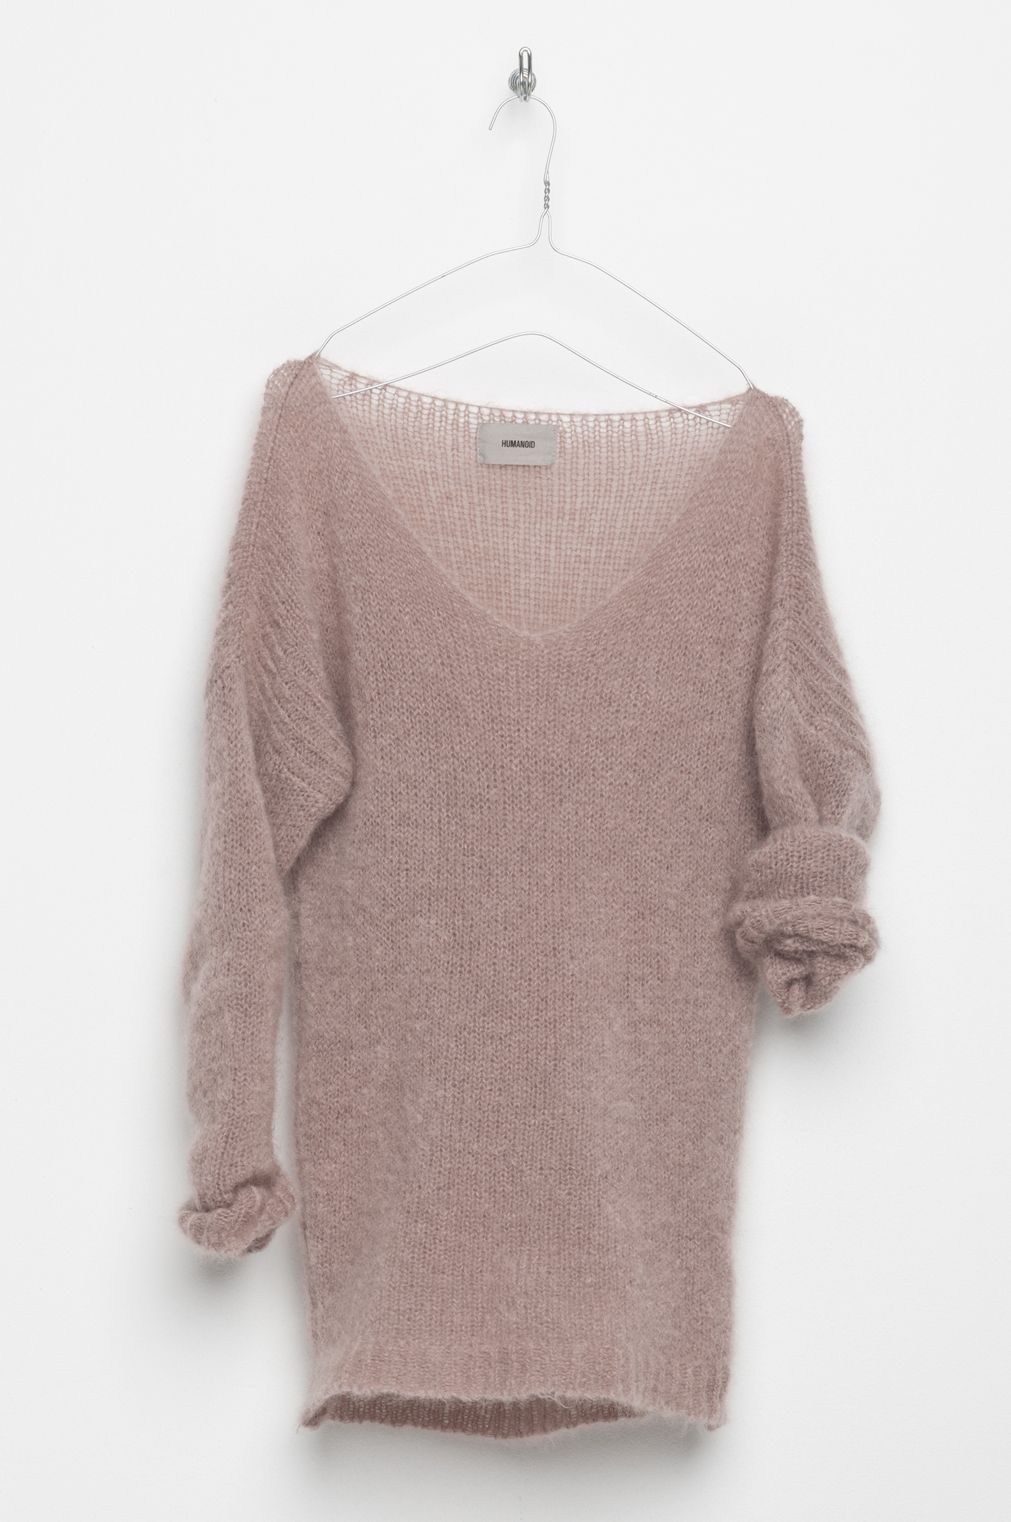 Oversized Sweater Love. #oversizedsweater #ootd | Barbie ...